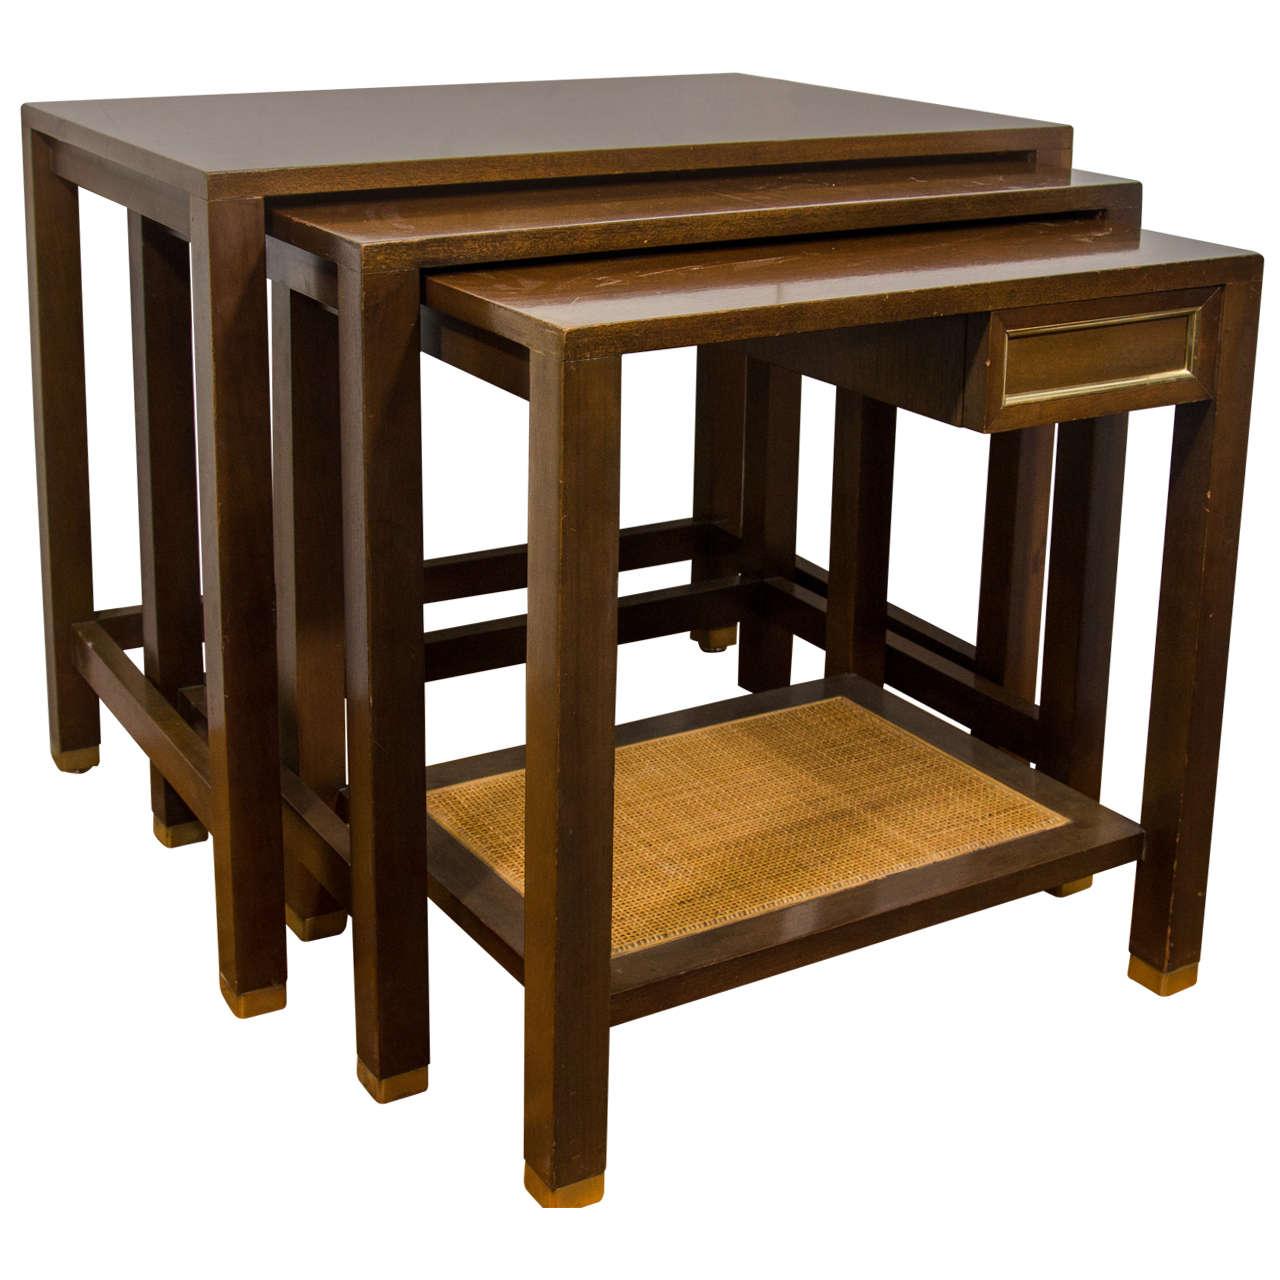 Midcentury set of harvey probber nesting tables for sale at 1stdibs midcentury set of harvey probber nesting tables for sale watchthetrailerfo